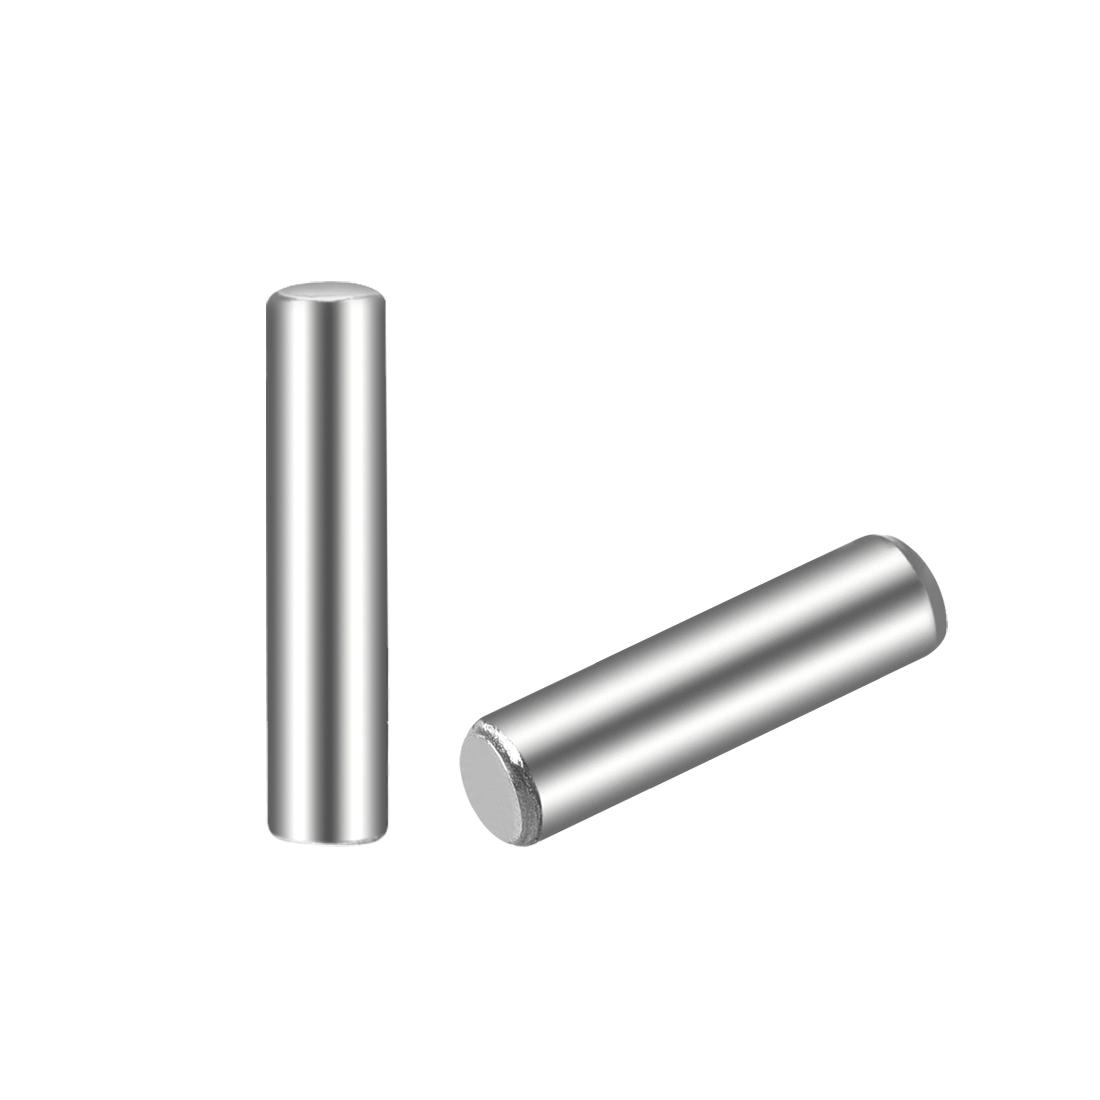 100Pcs 2.5mm x 12mm Dowel Pin 304 Stainless Steel Shelf Support Pin Fasten